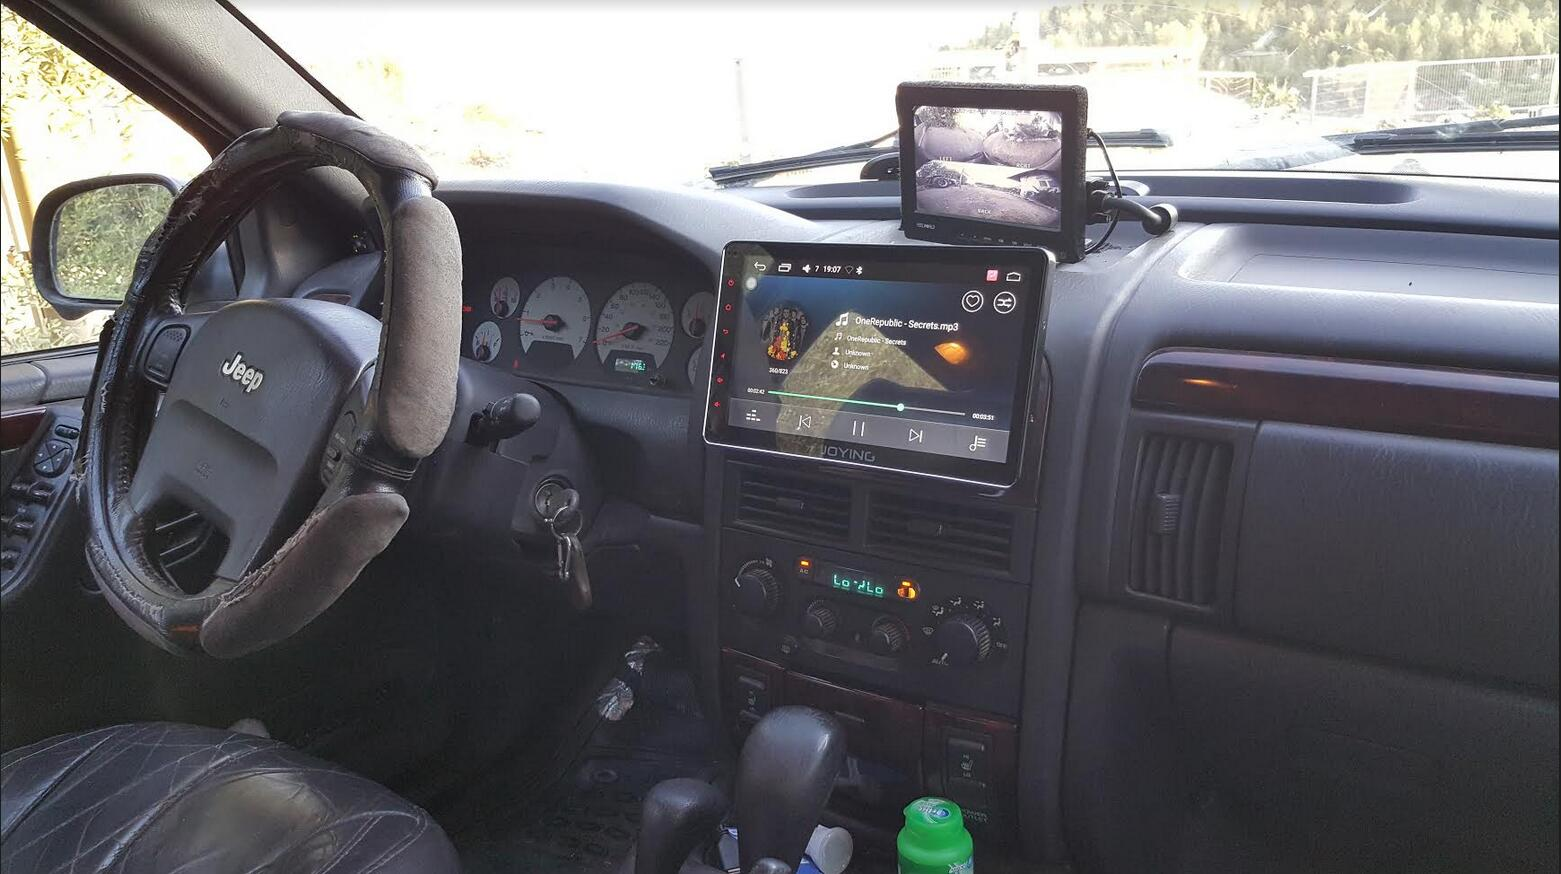 2004 Jeep Wrangler Radio Wiring Harness As Well As Dodge Grand Caravan